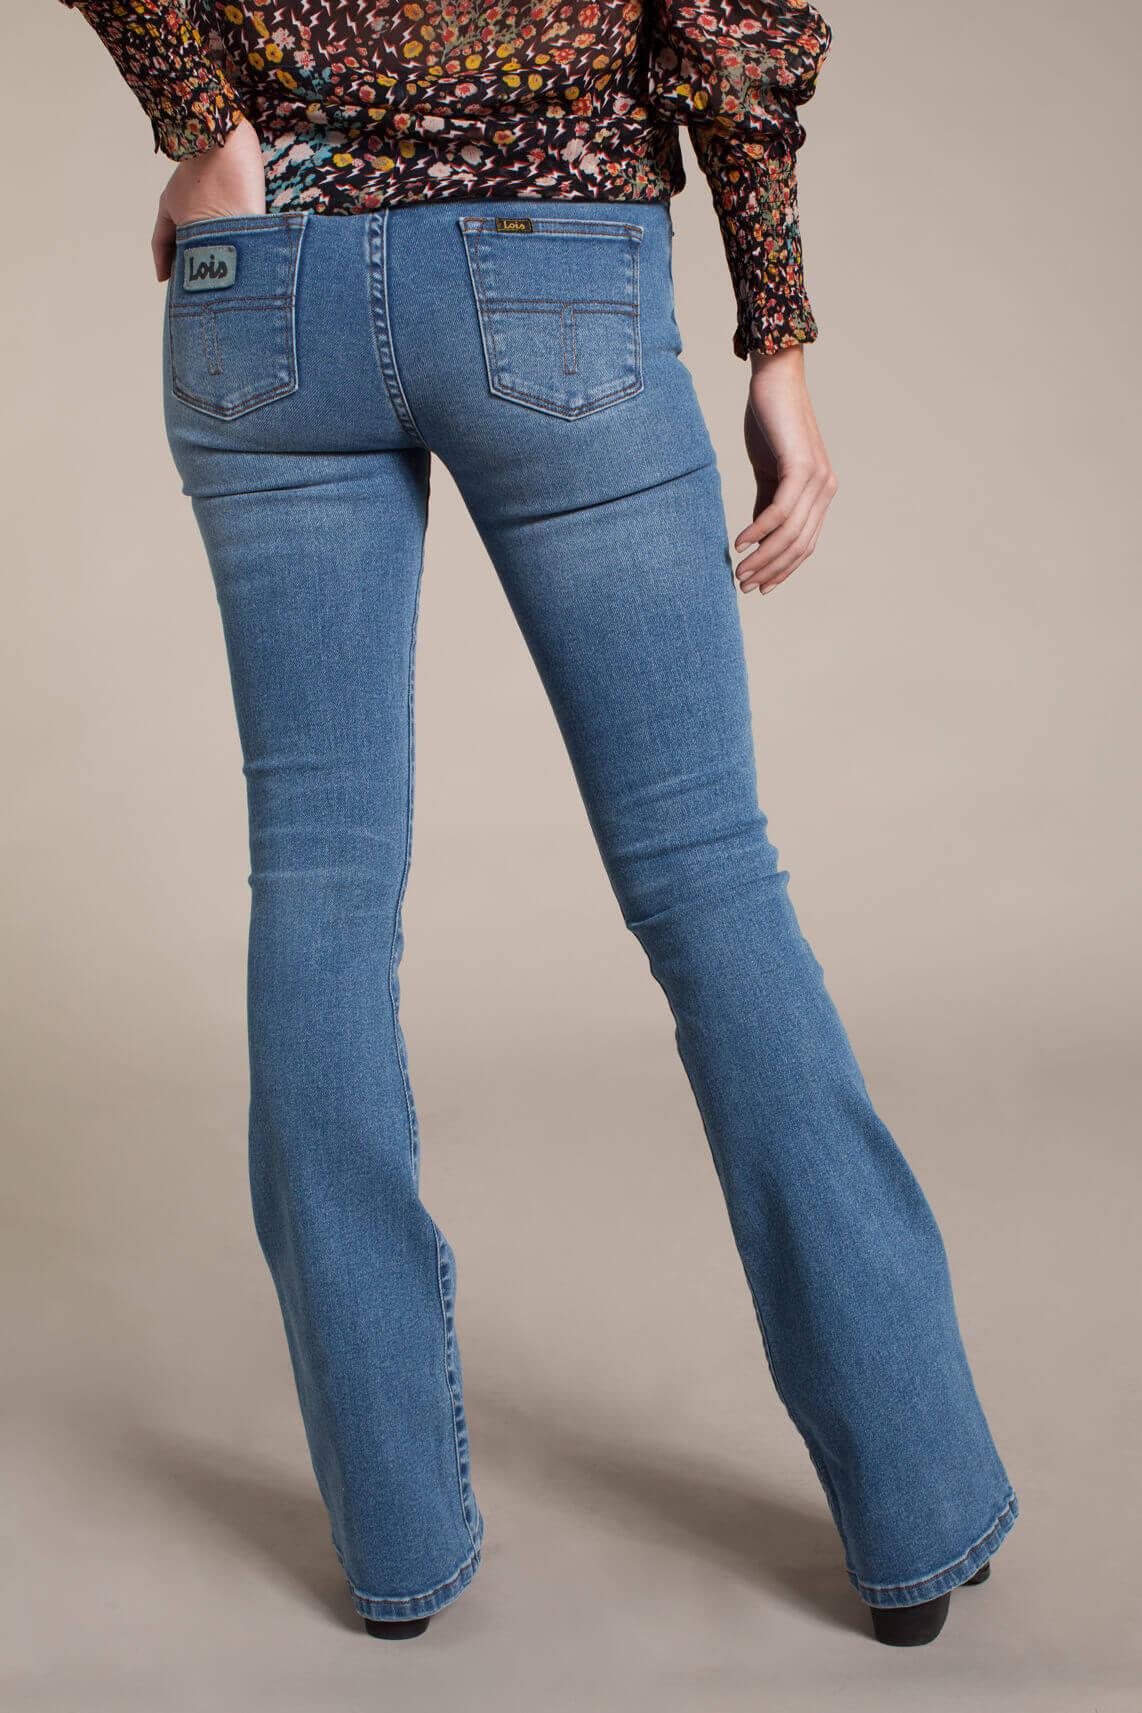 Lois Dames L32 Raval super high rise flared jeans Blauw